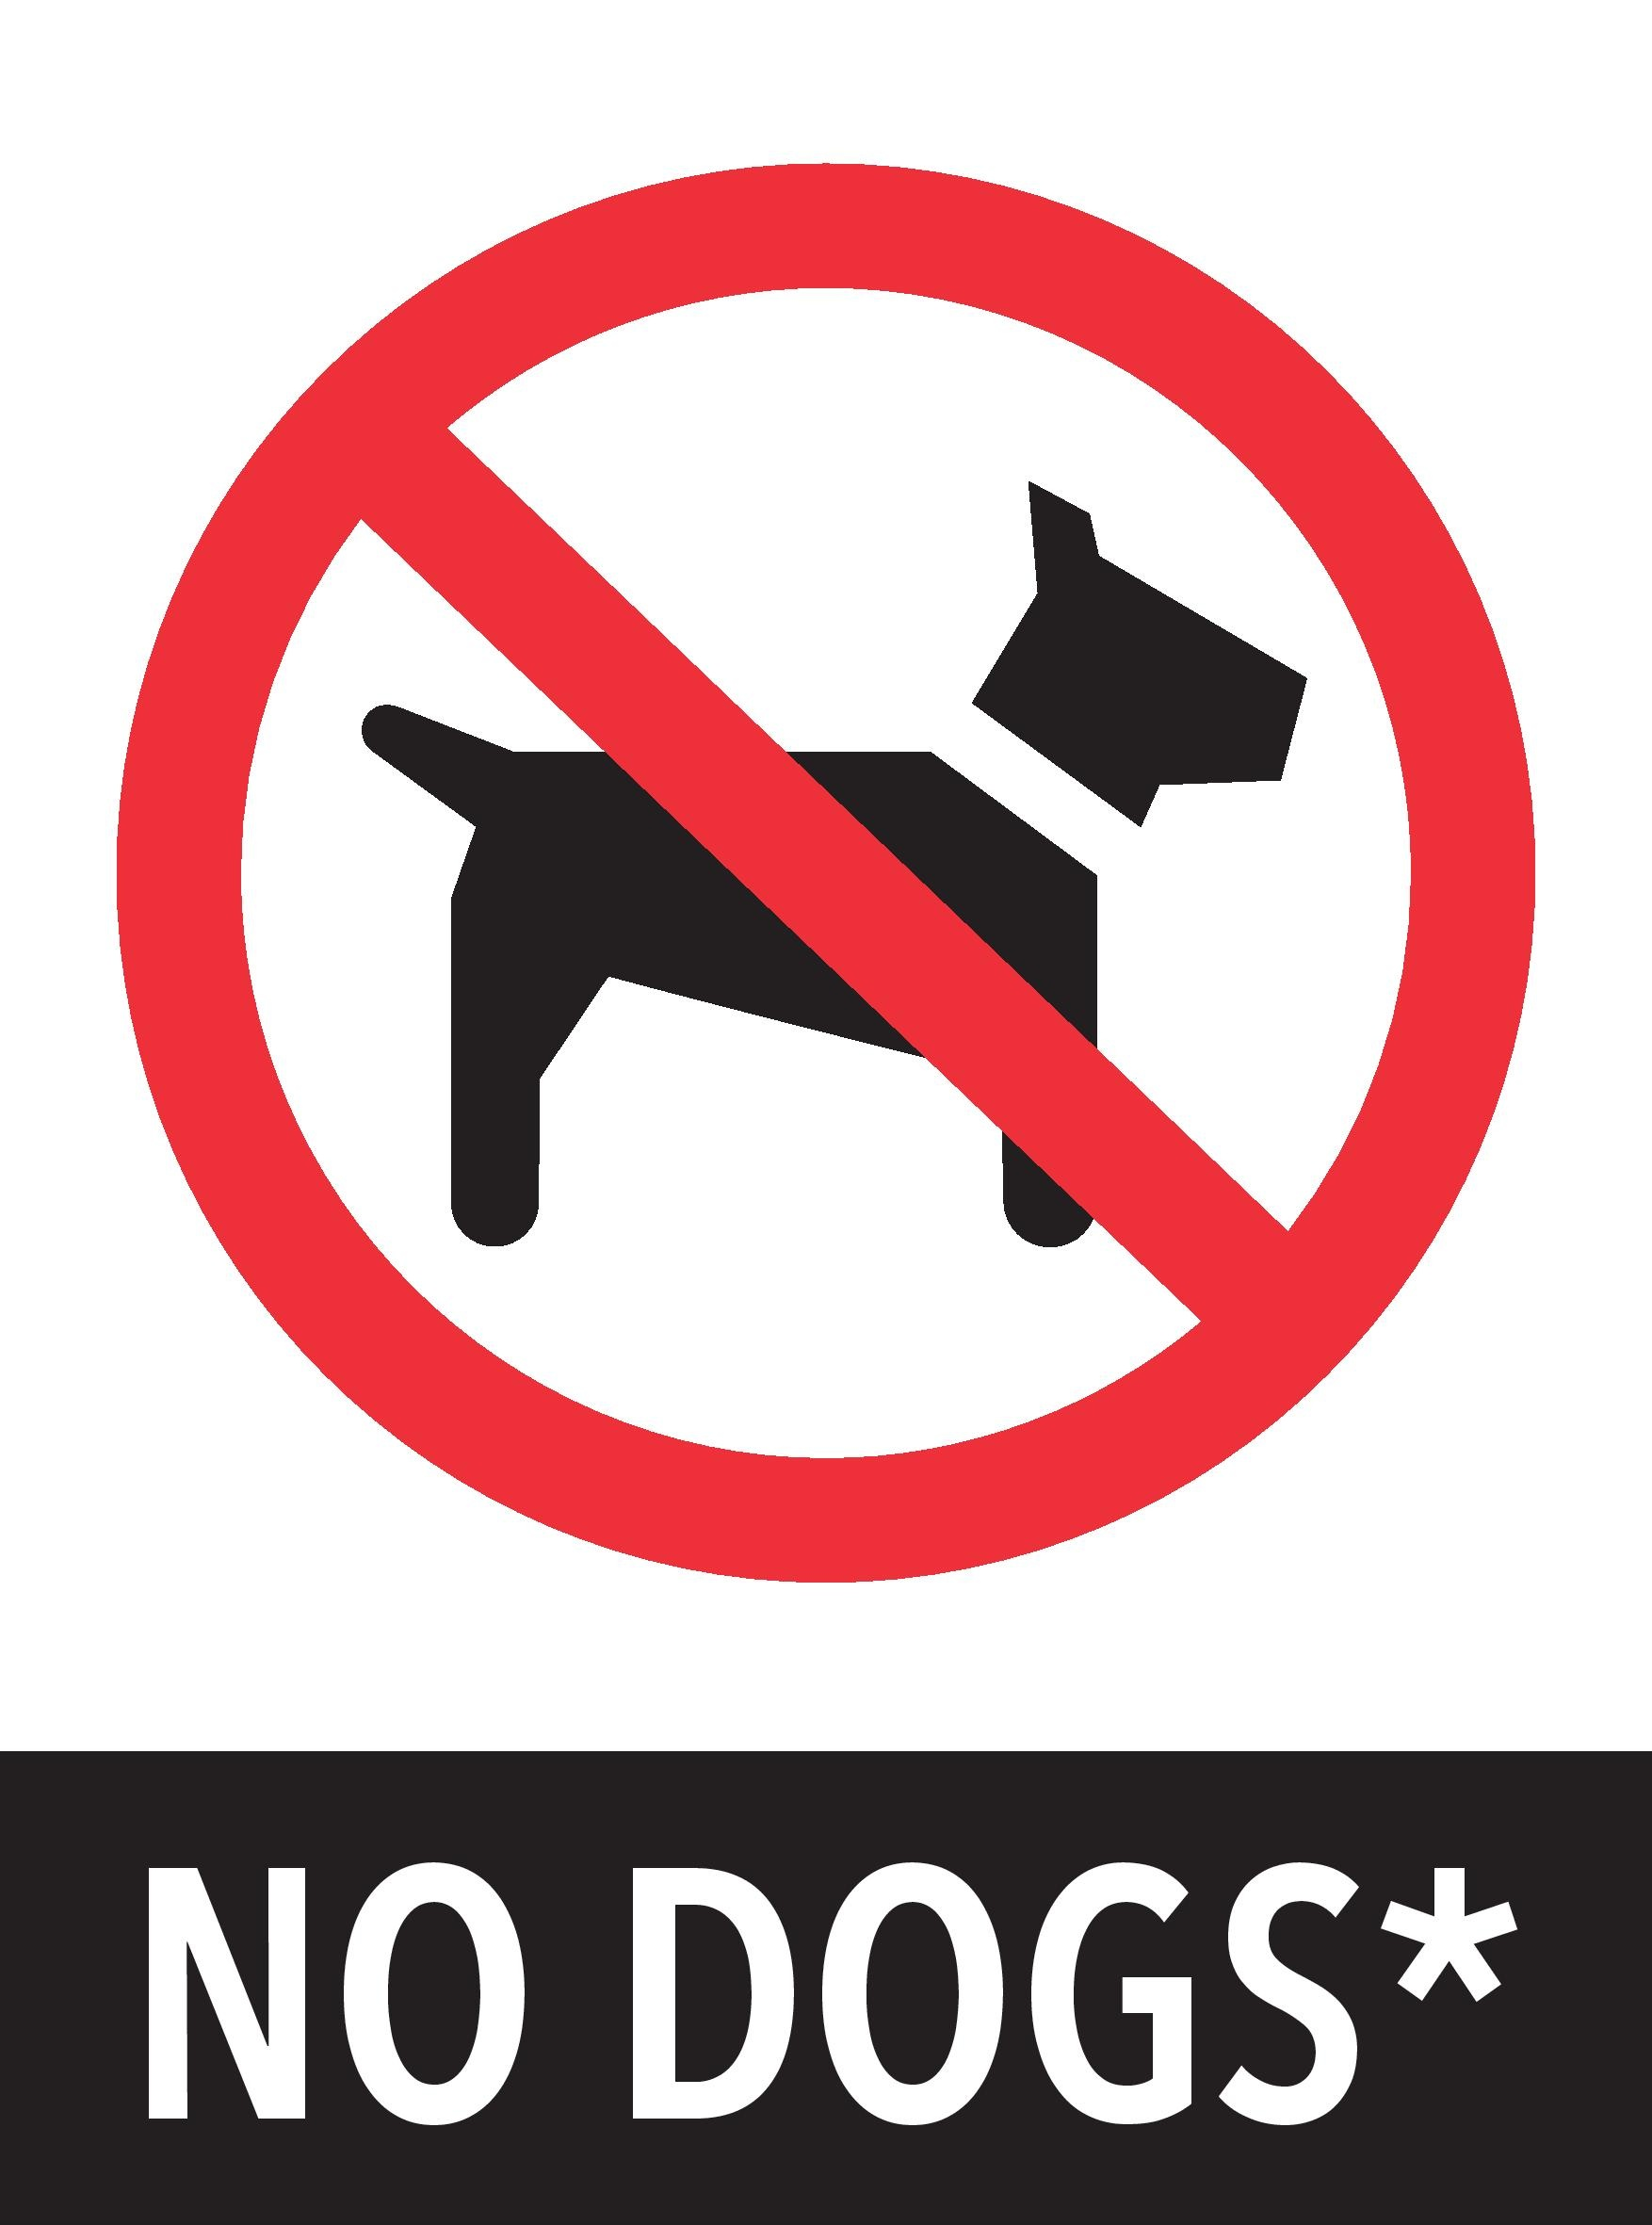 No+dogs.jpg